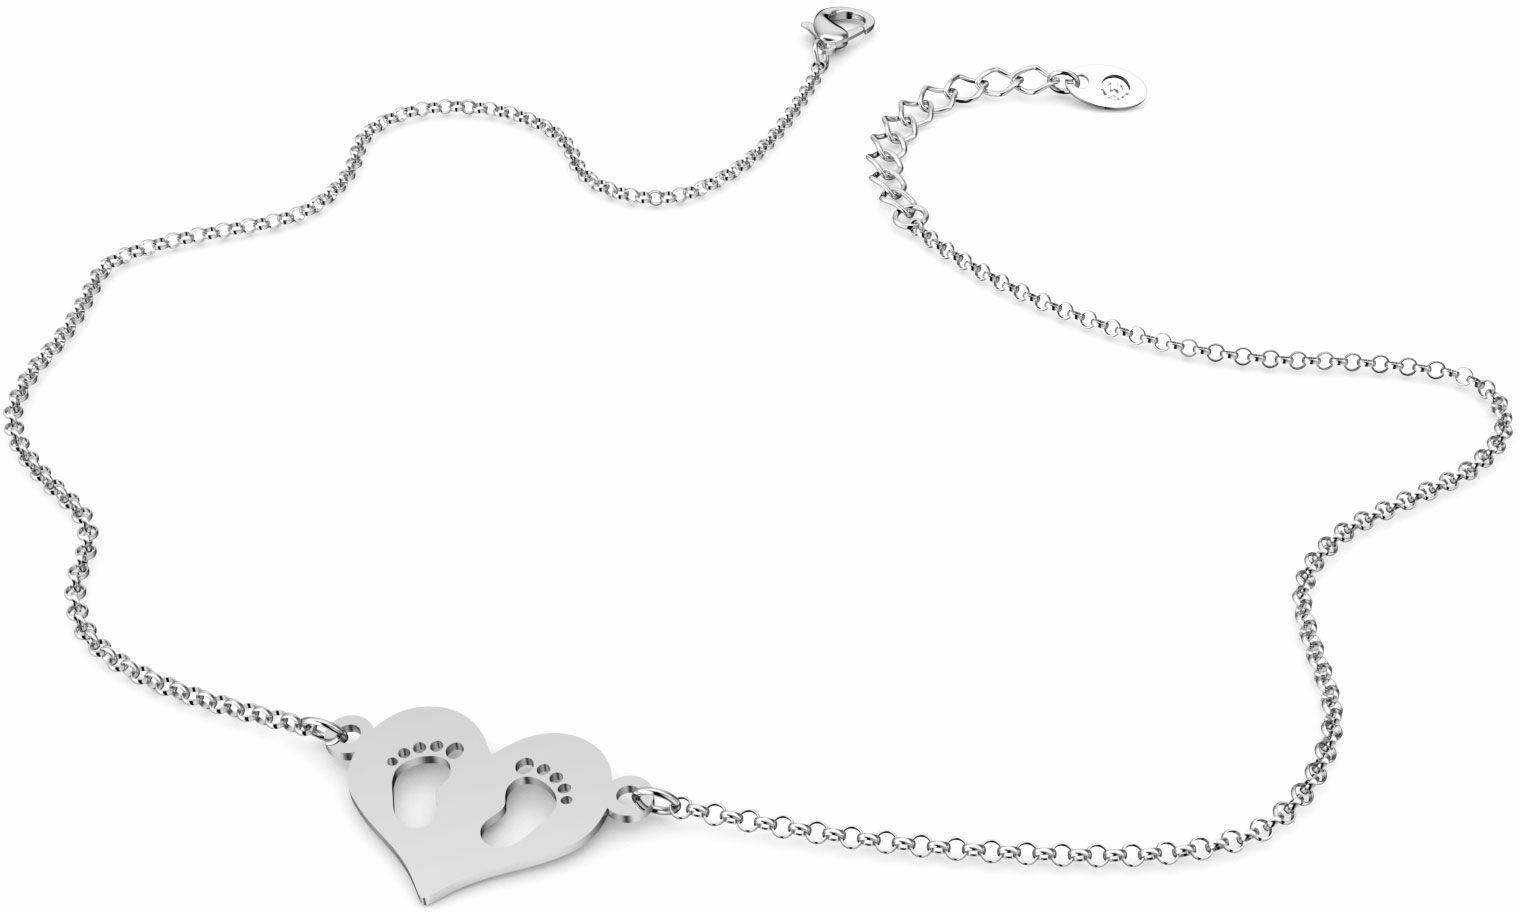 Naszyjnik srebrny z sercem i stopkami